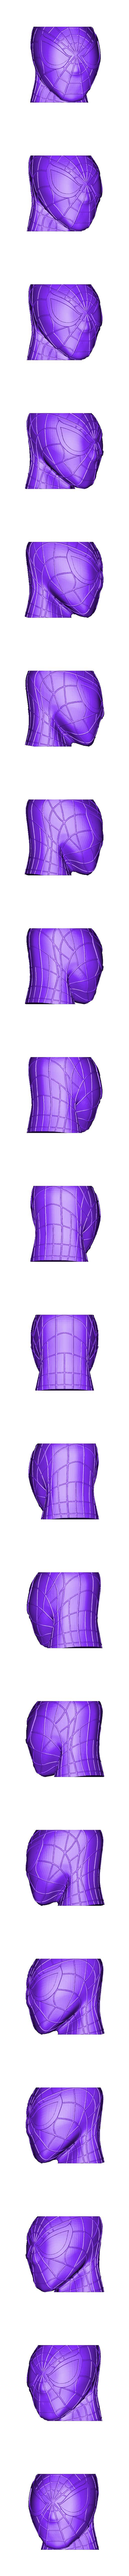 Spiderman_head_Pen_Holder.stl Download free STL file Spiderman Pen Holder • 3D printing template, Kbezzon